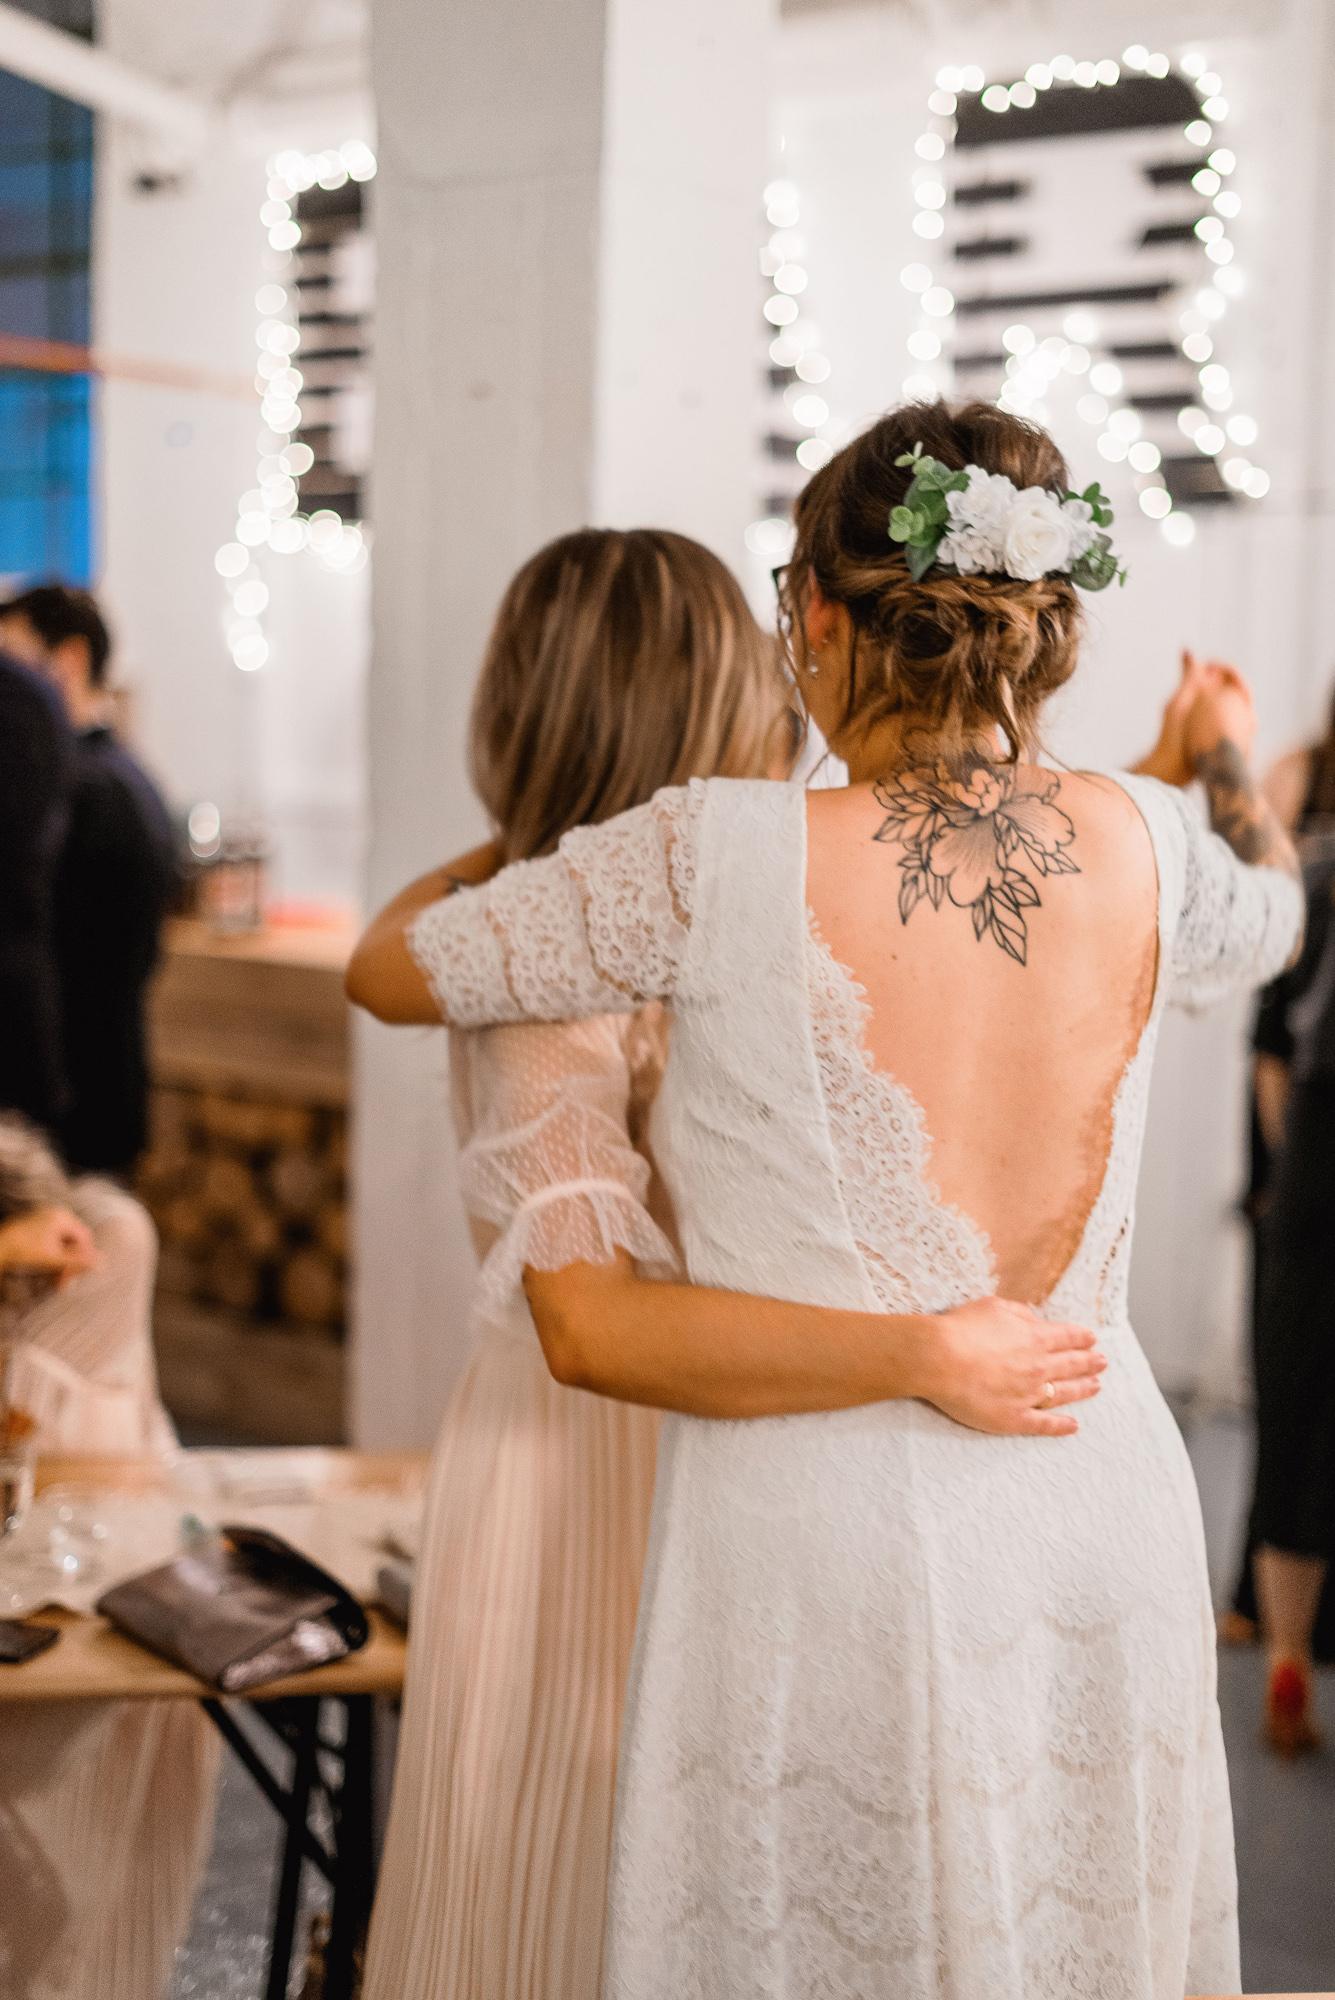 Harriet-Dahlia-Bespoke-Lace-Silk-Bohemian-Wedding-Dress-Sleeves-Tattooed-Bride-Alternative-Wedding-Sheffield-36.jpg